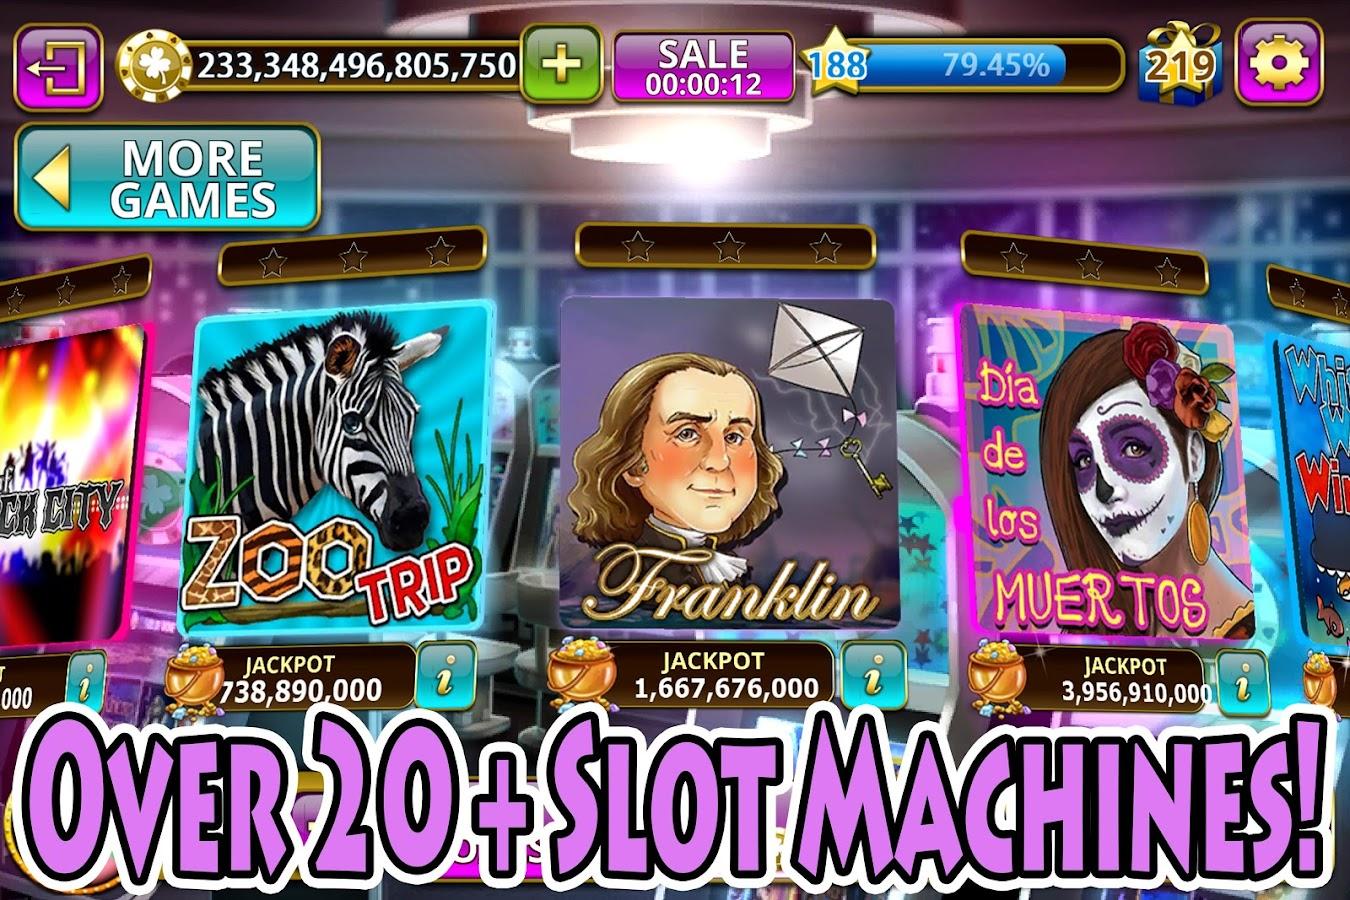 Super Firestar Slots - Play Online & Win Real Money